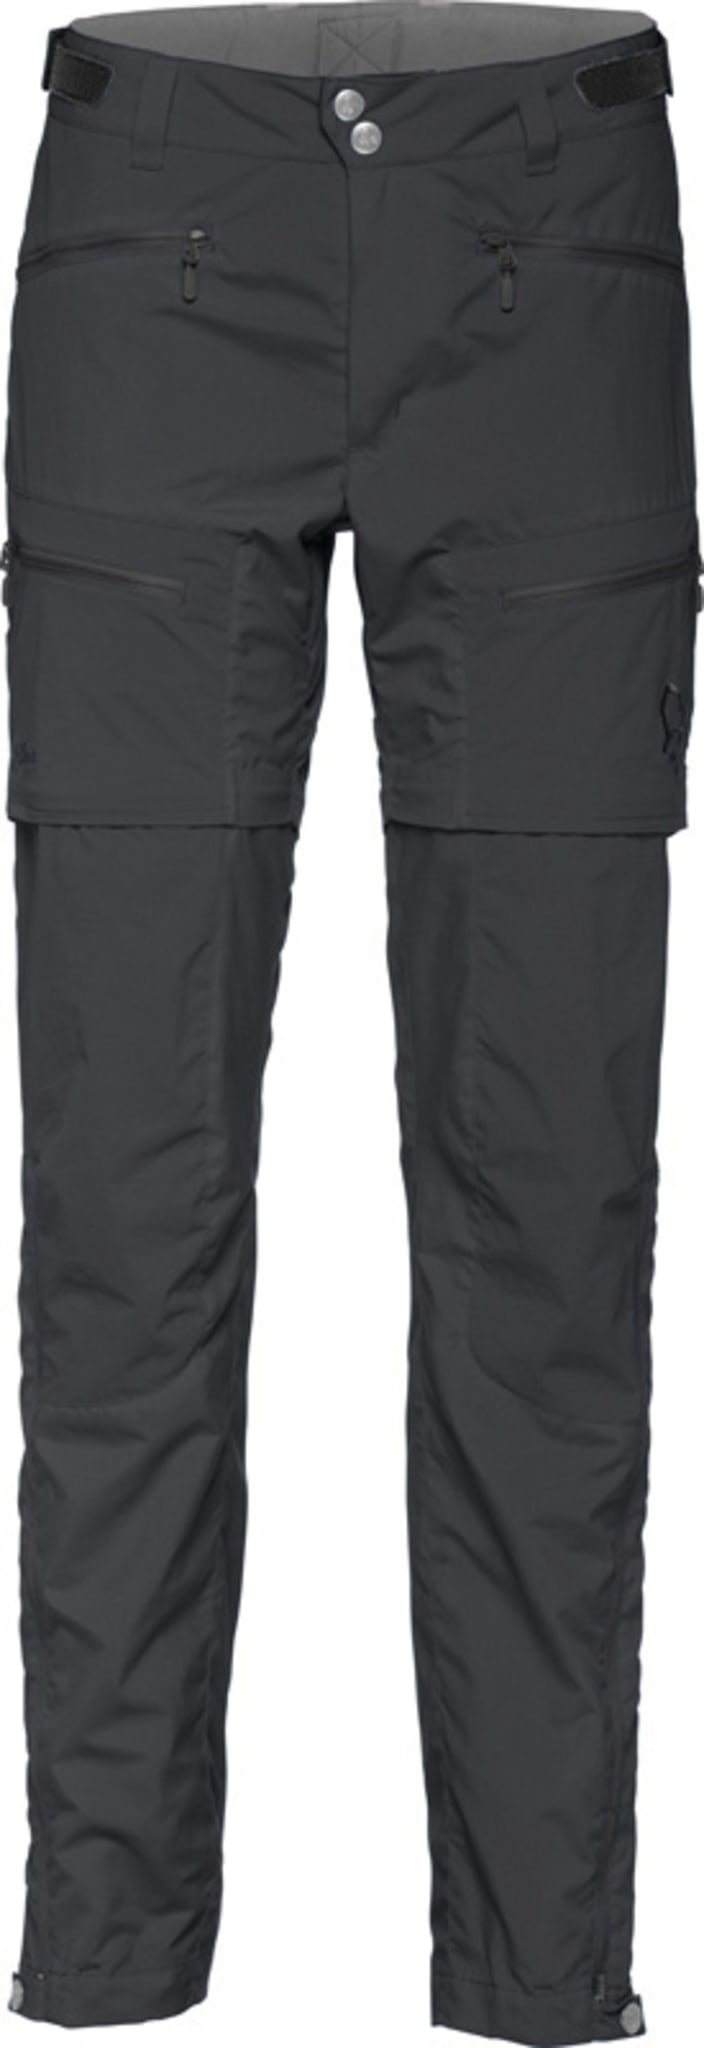 Friluftsbukse og shorts i ett